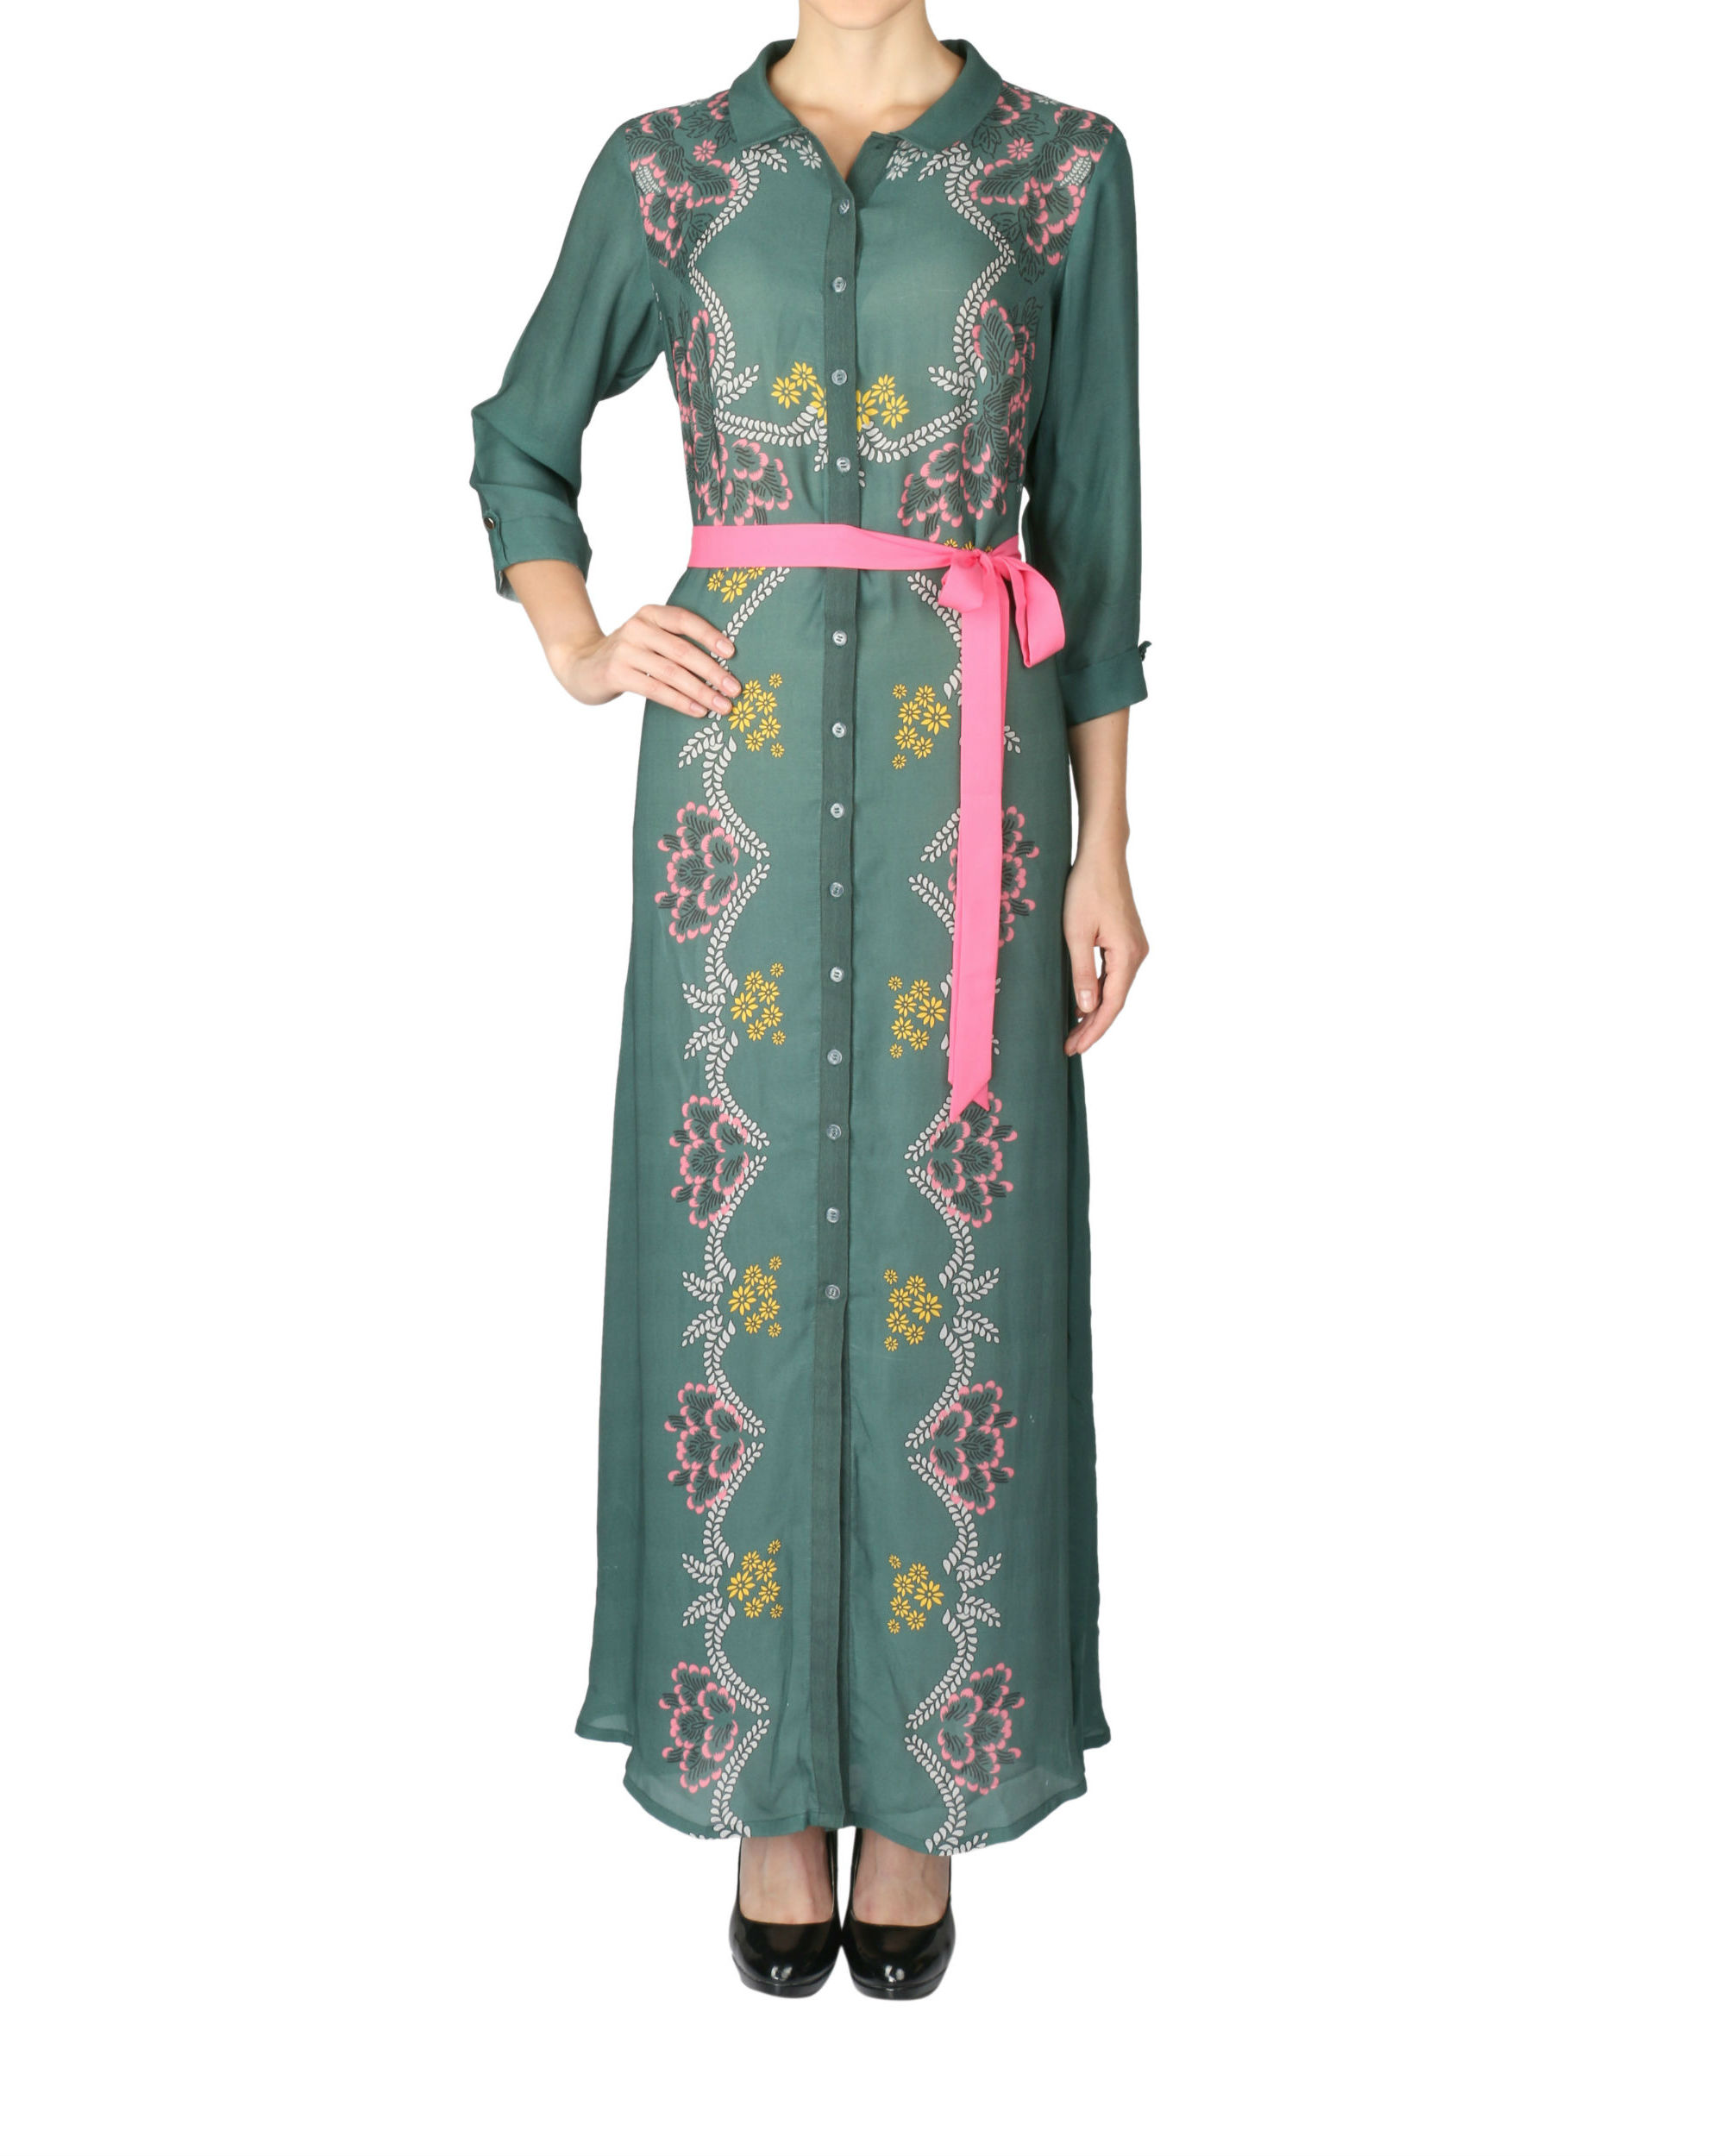 Olive green printed dress